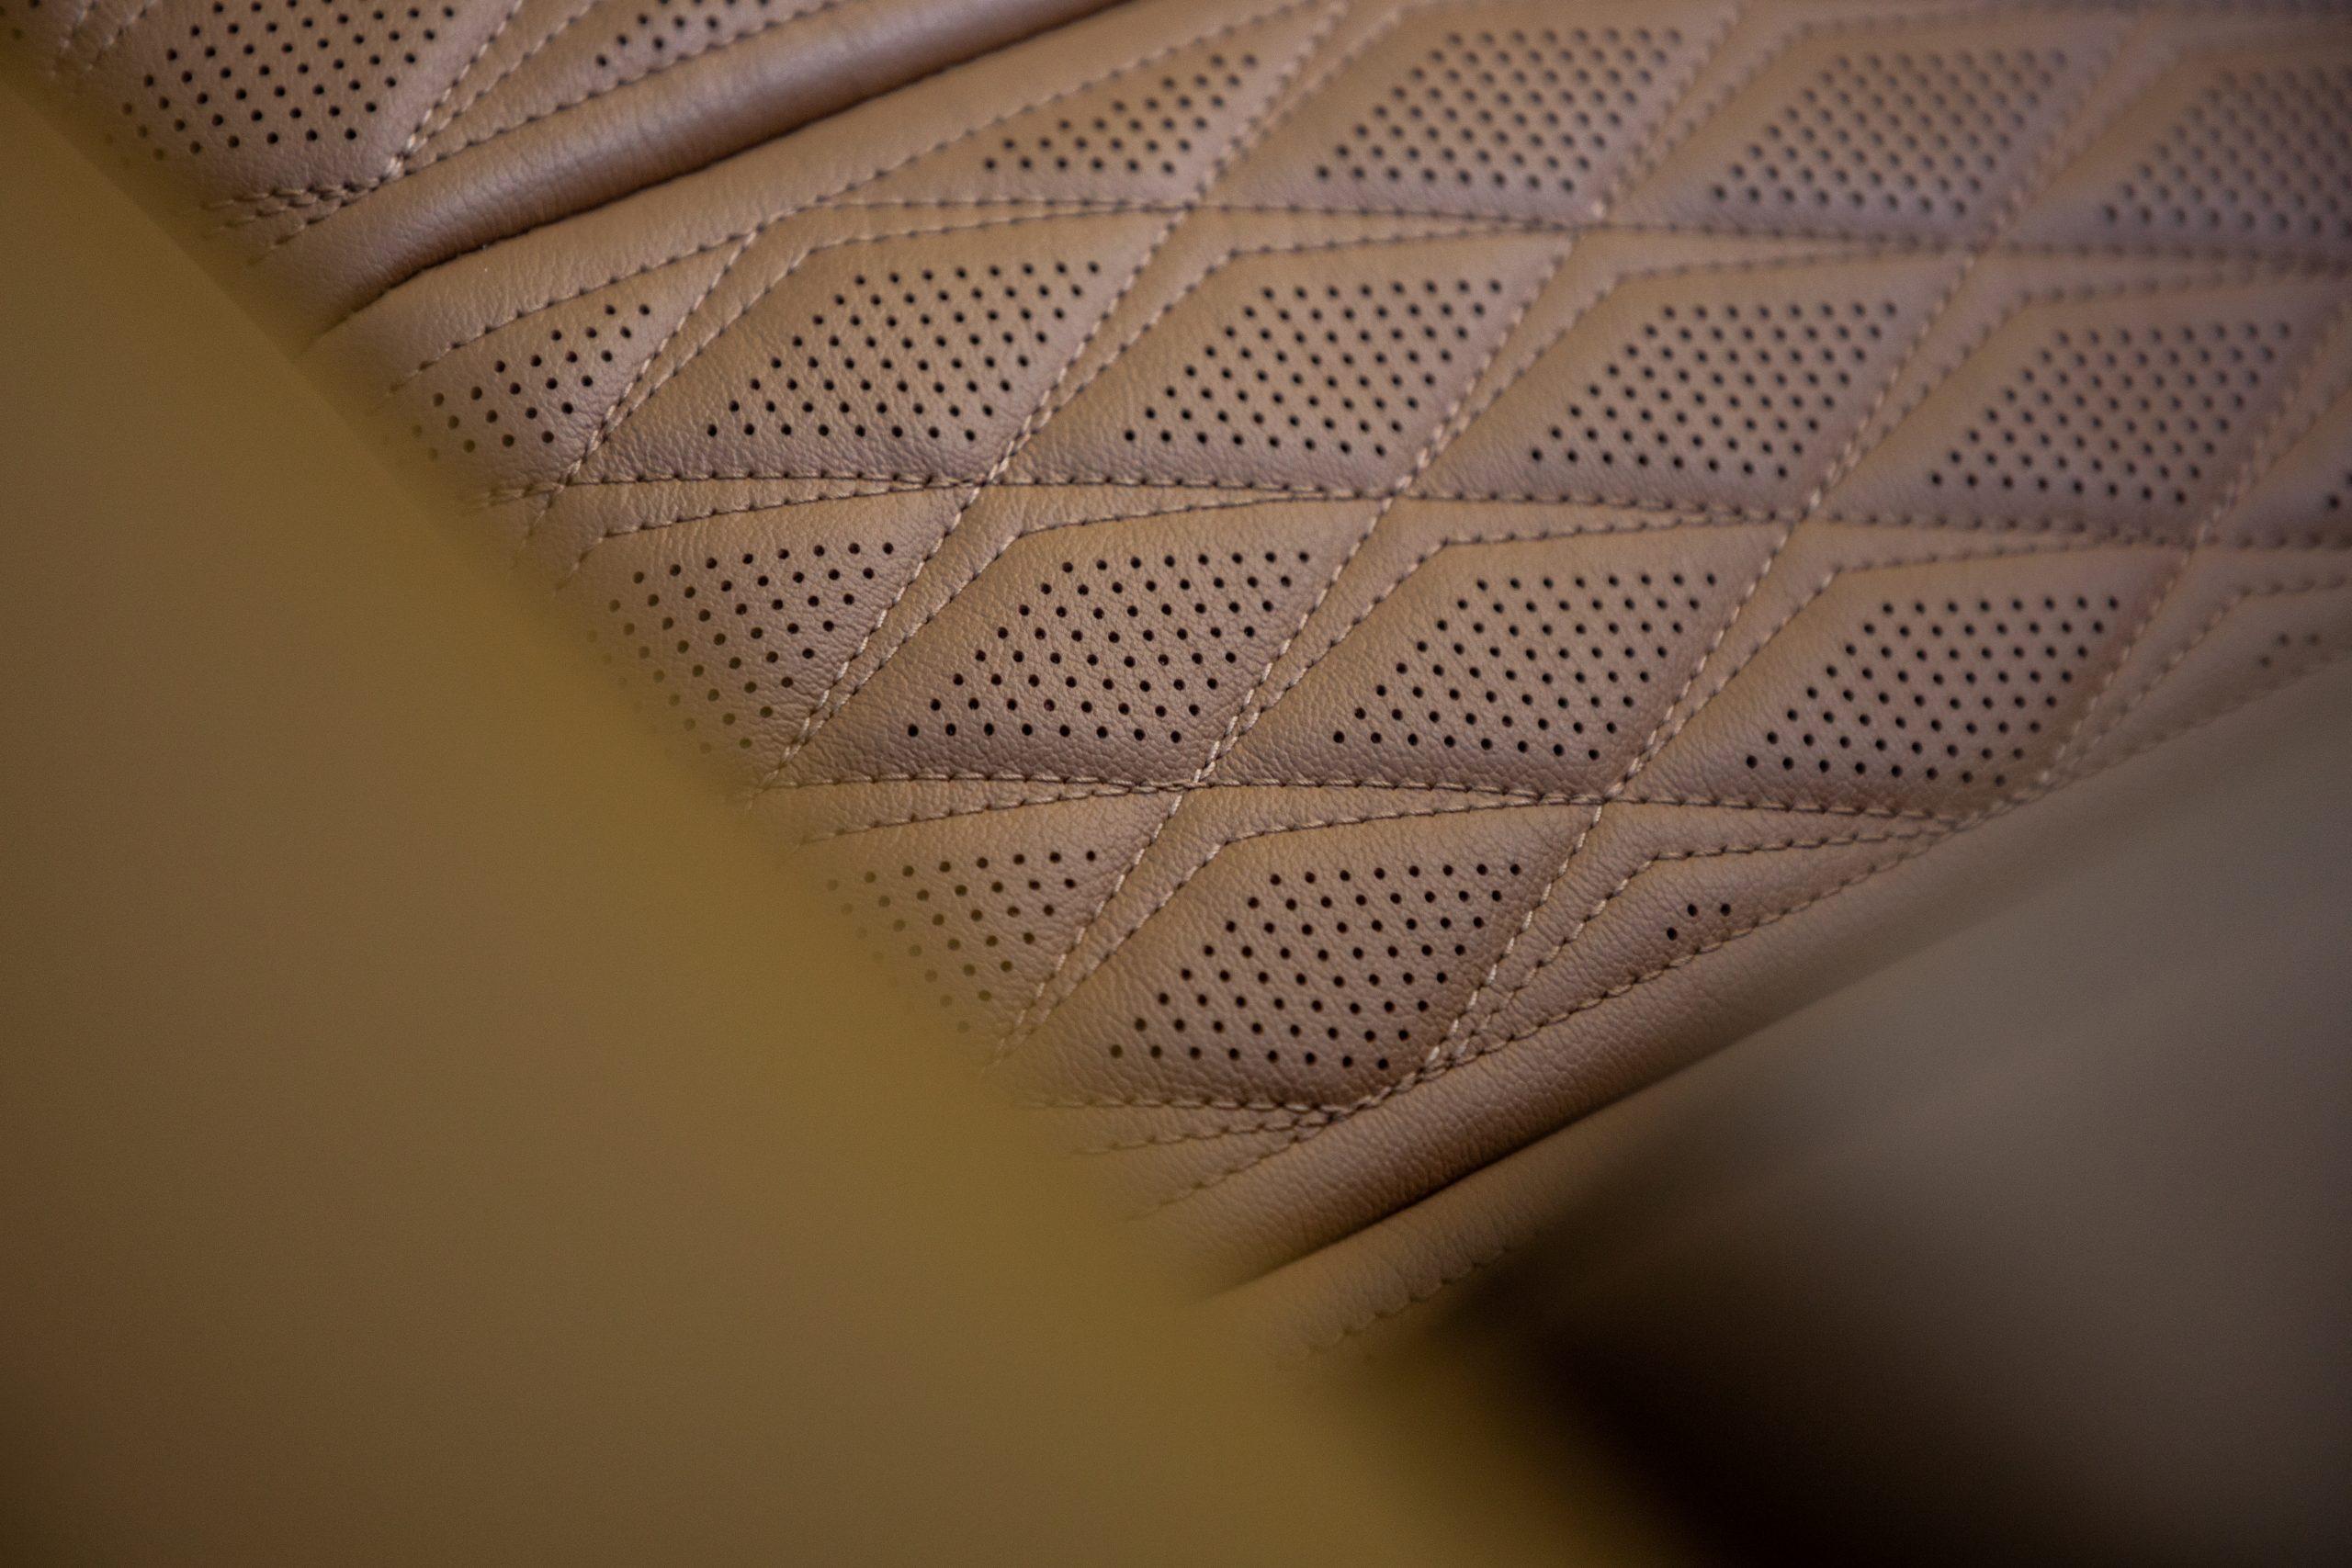 cadillac escalade leather diamond stitching